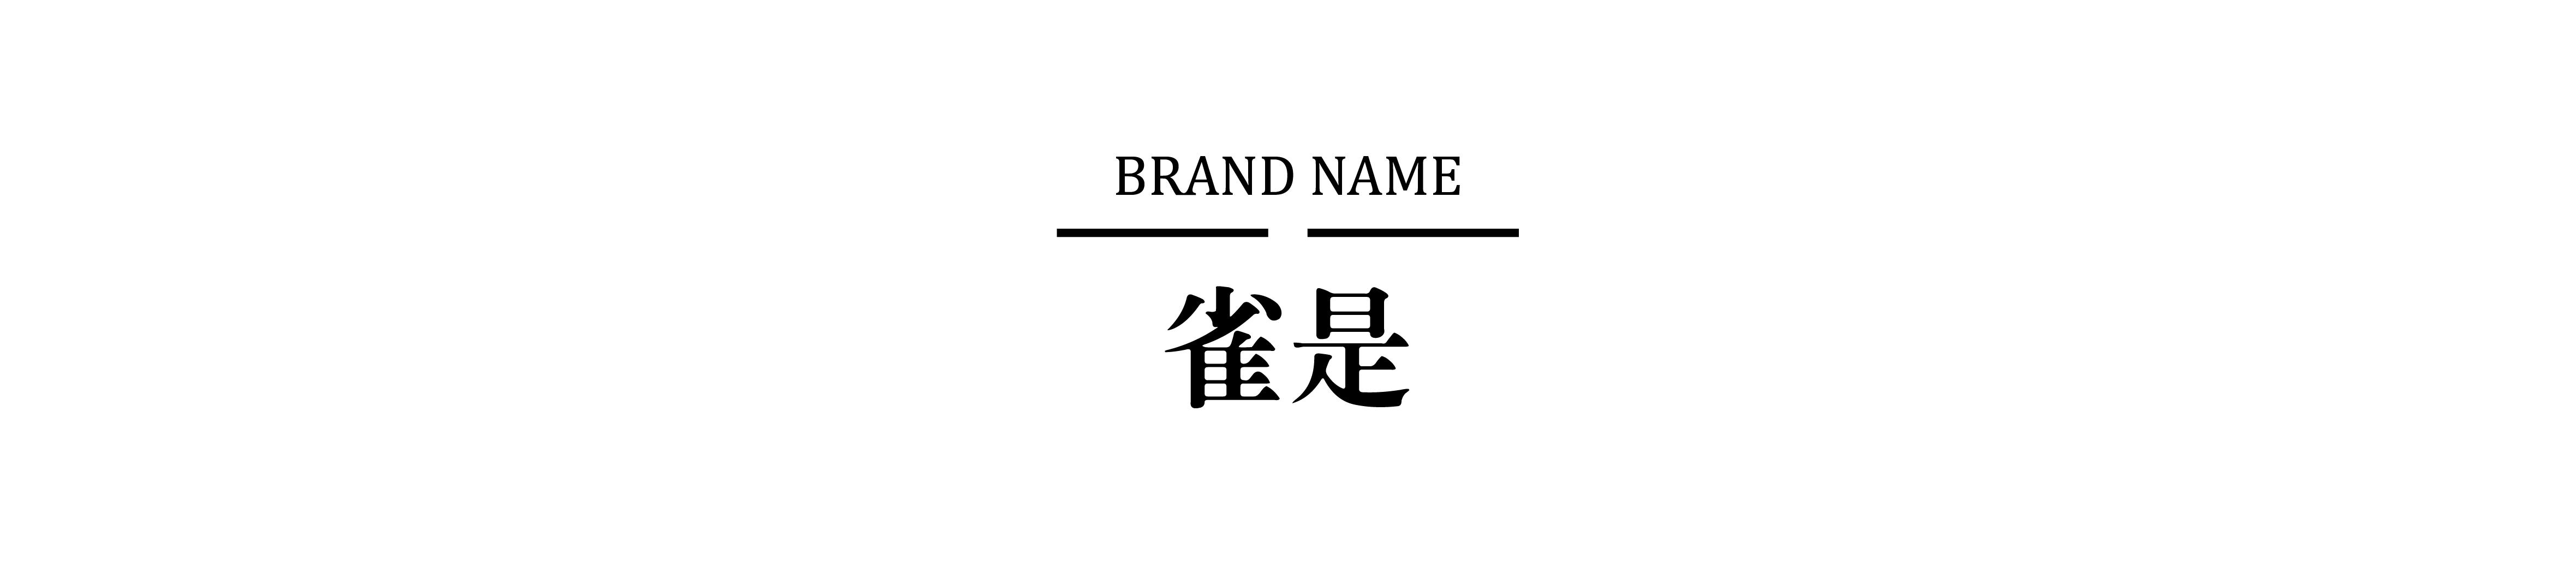 brandname.png